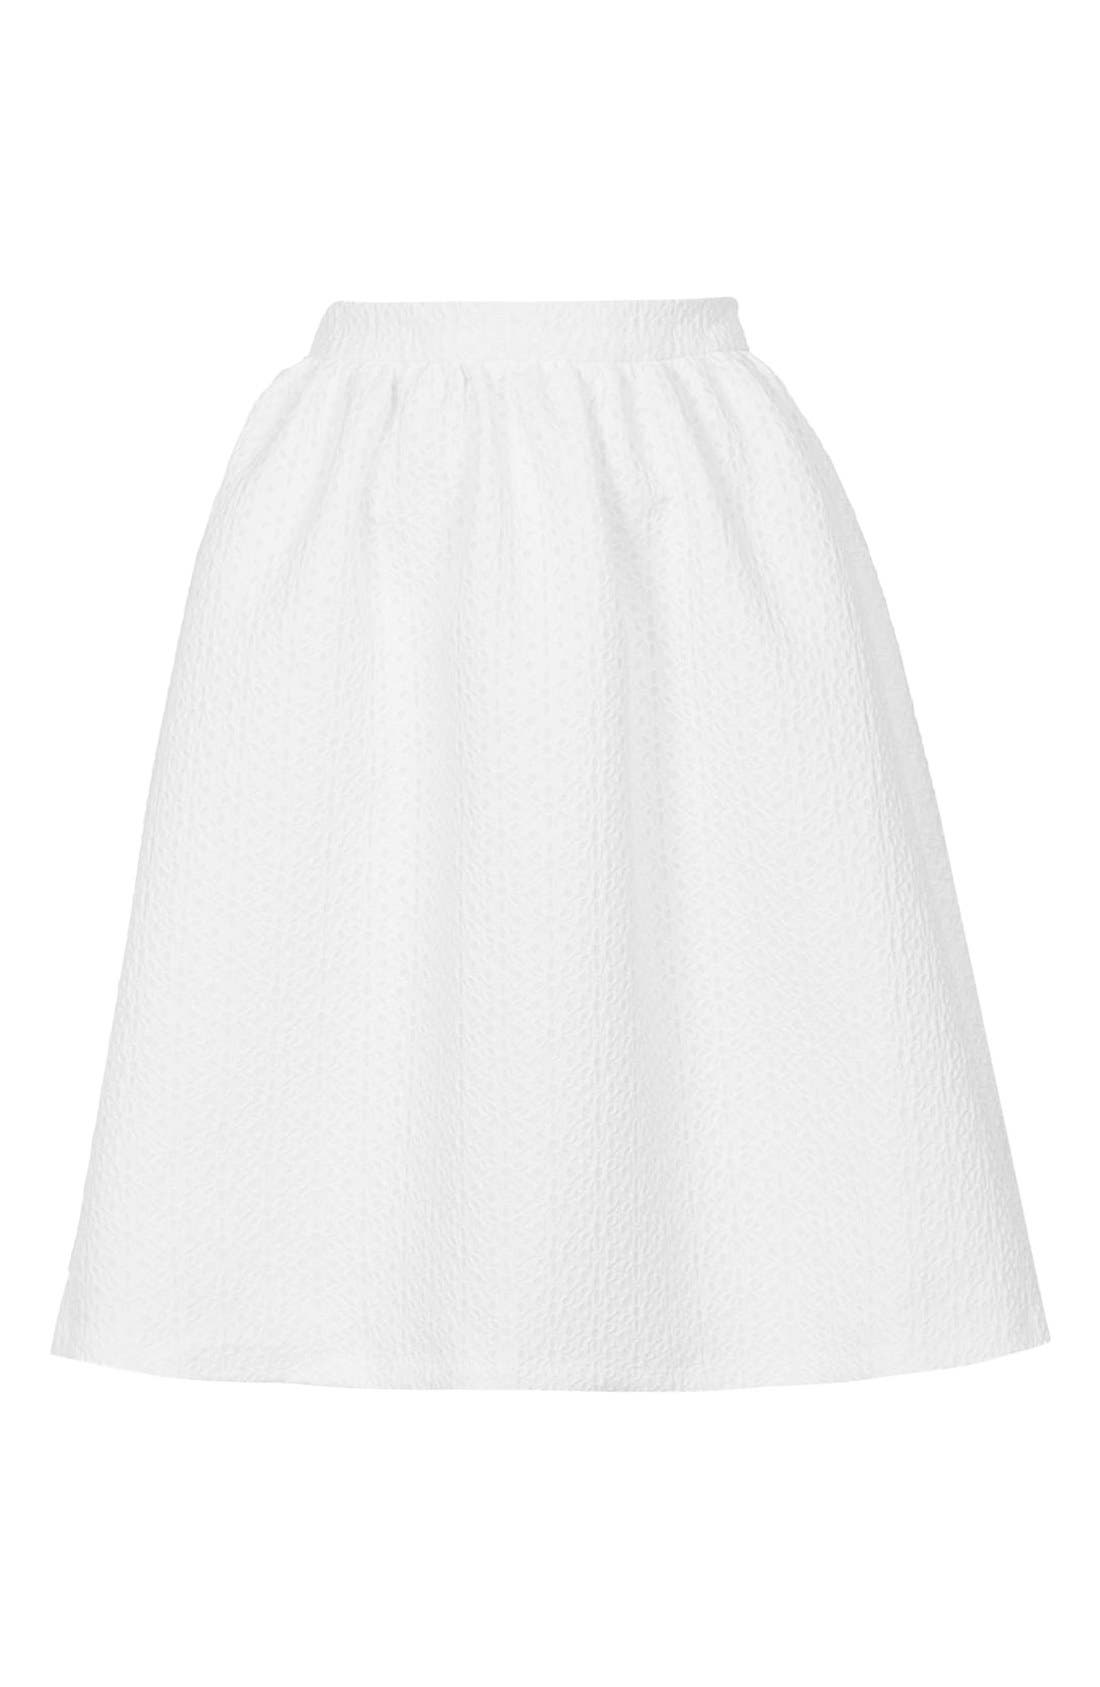 Alternate Image 3  - Topshop Daisy Jacquard Flare Skirt